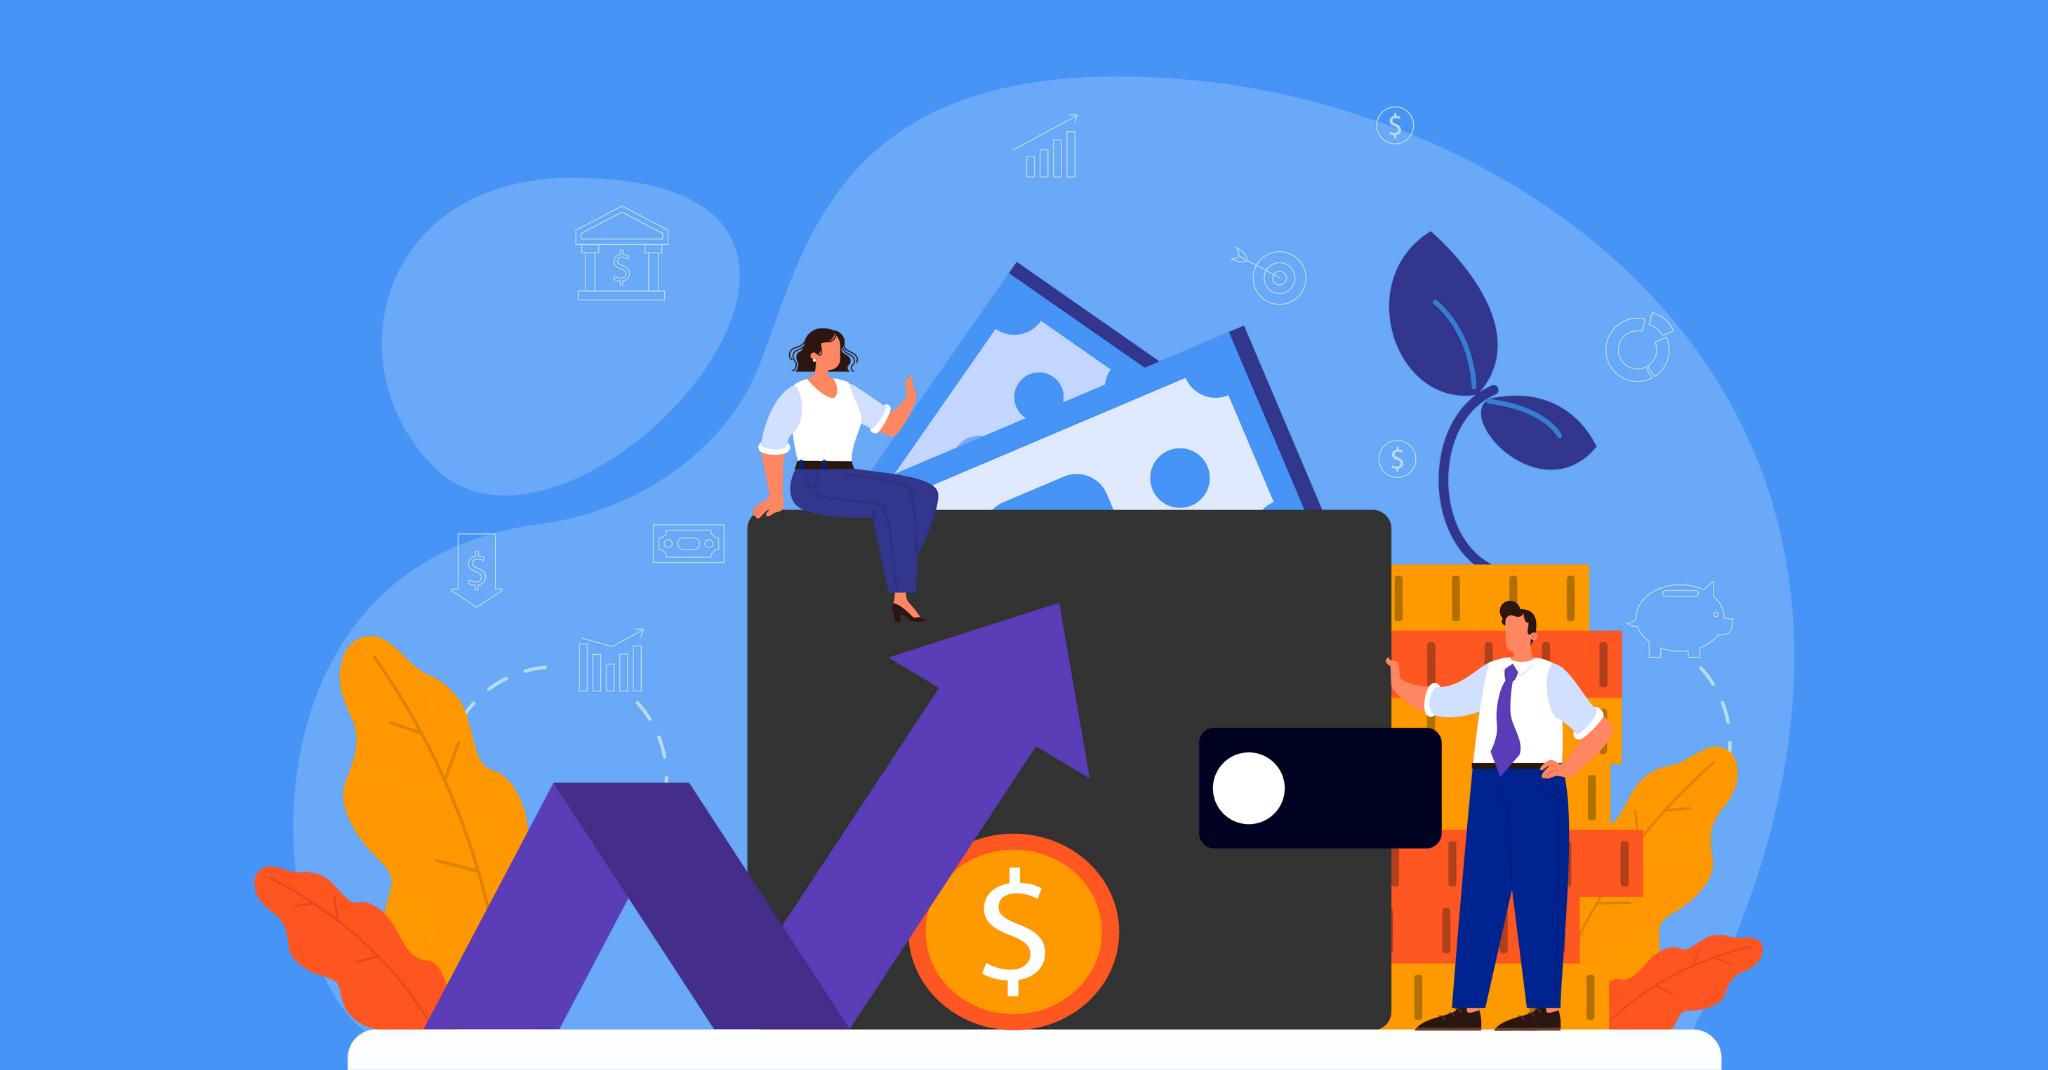 Accounting Salaries Post-Covid: 2021 and Beyond